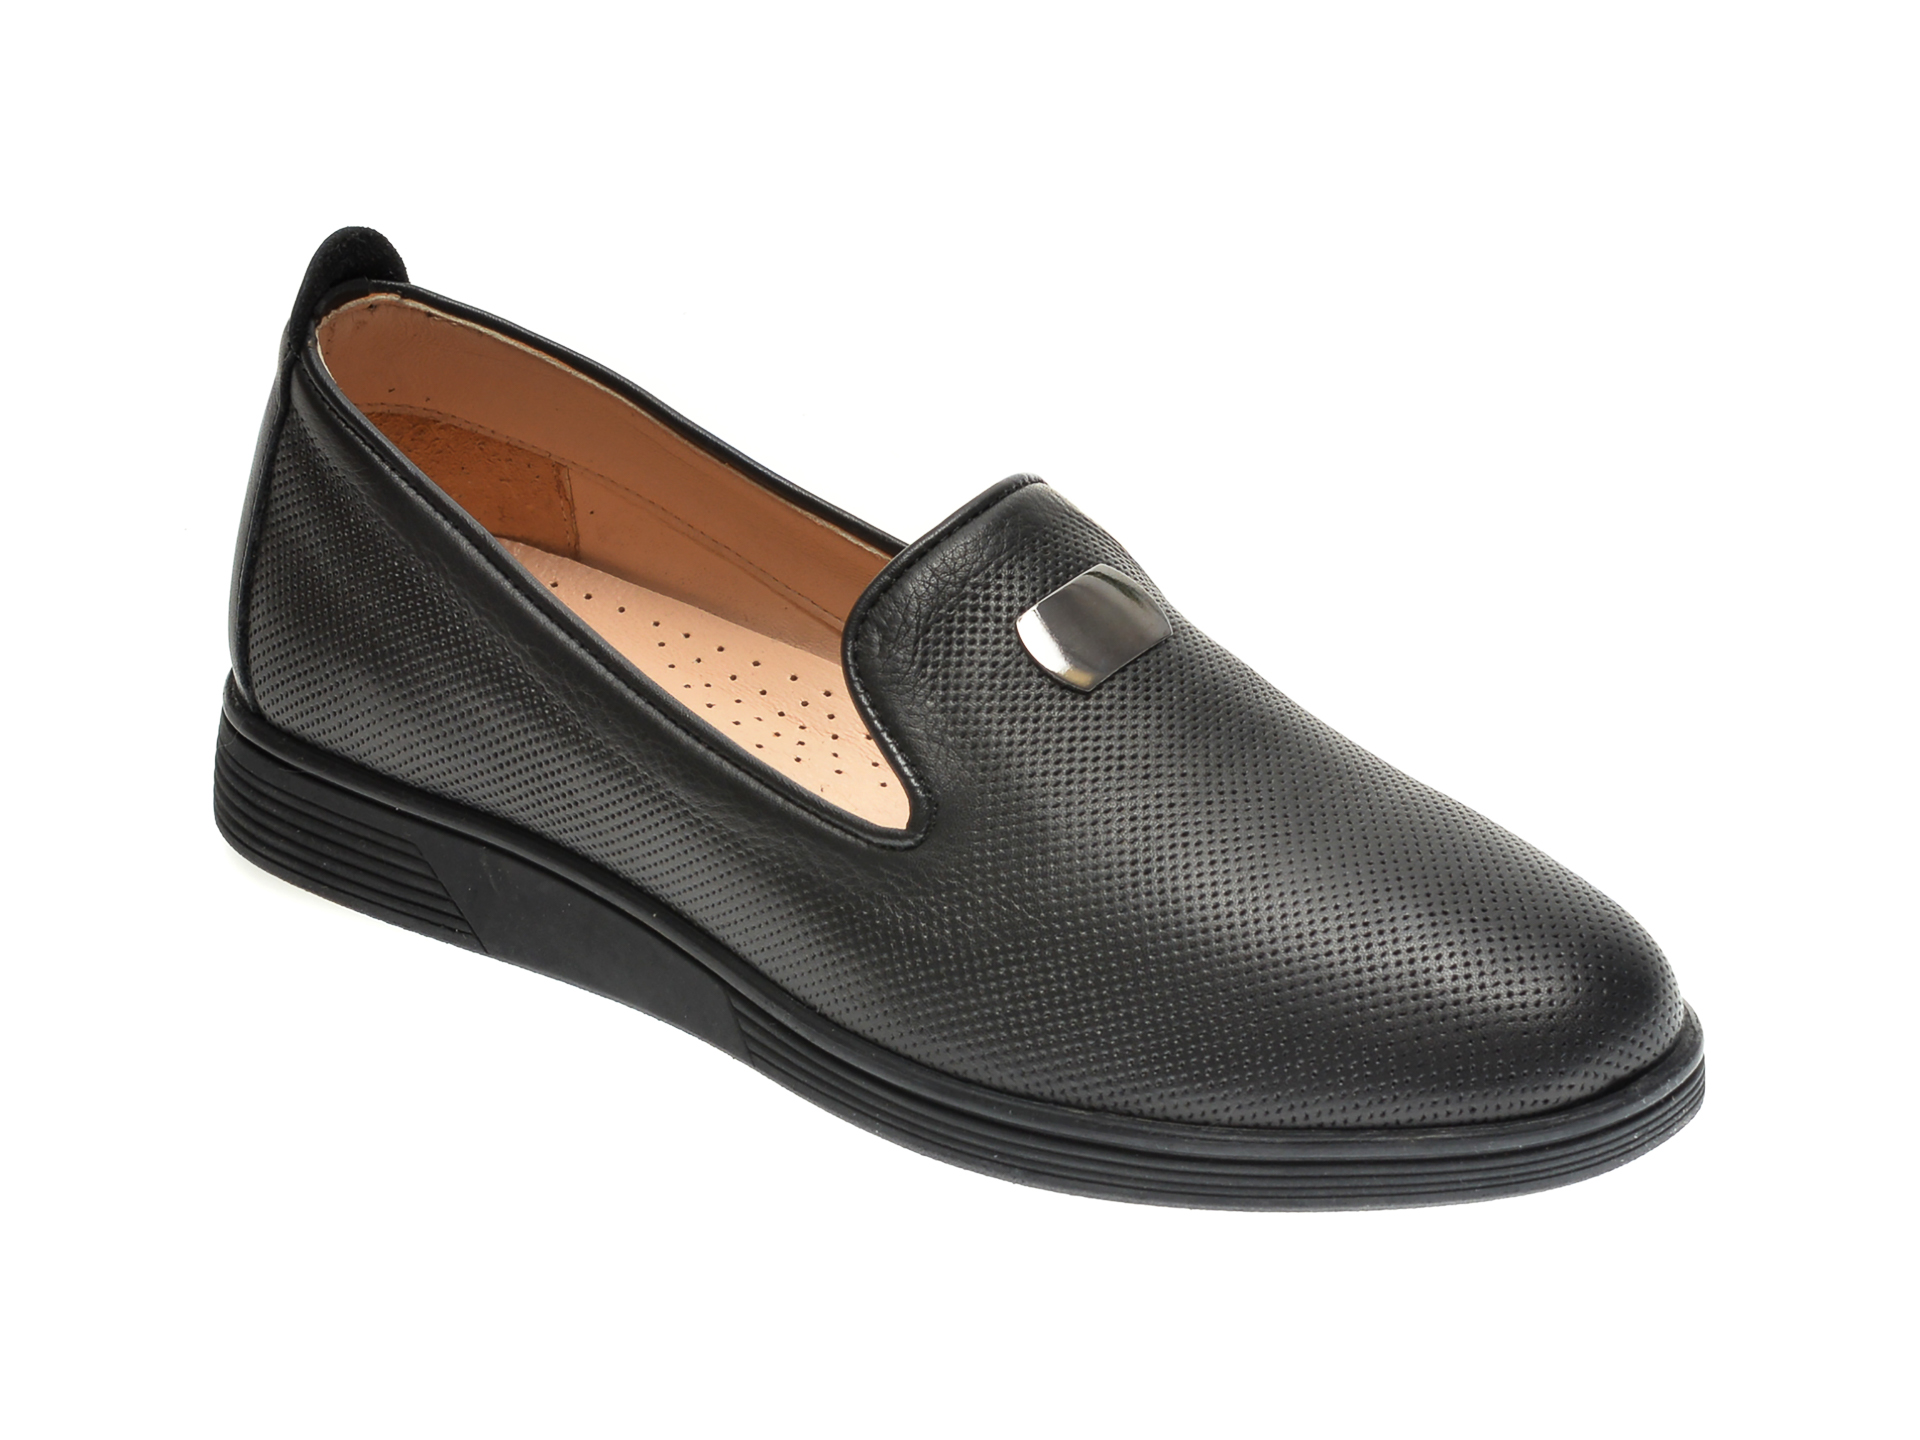 Pantofi ILOZ negri, 3, din piele naturala imagine